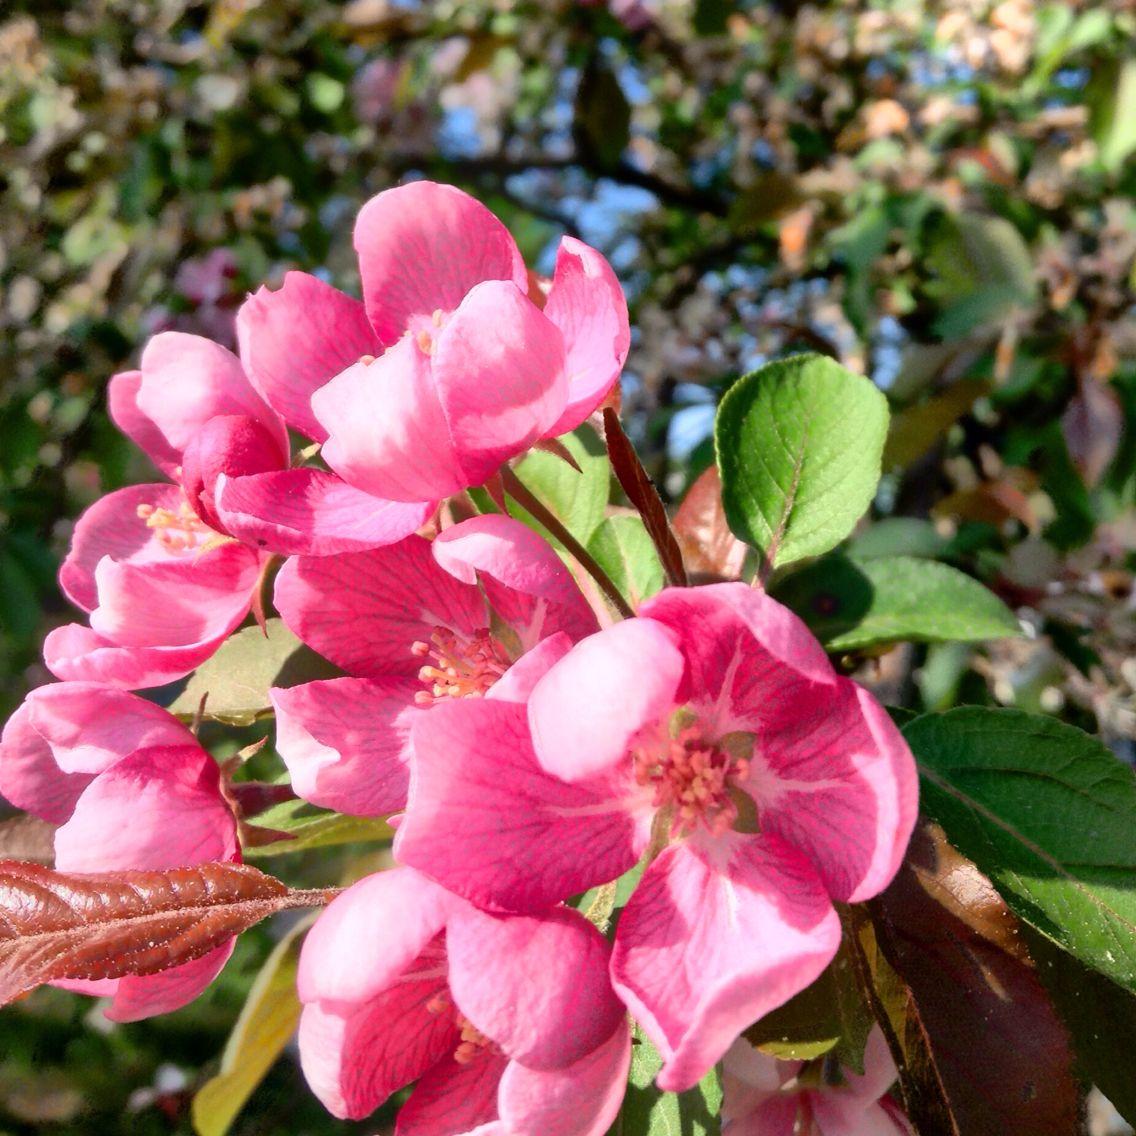 Flowers on the farm Flowers, Plants, Farm